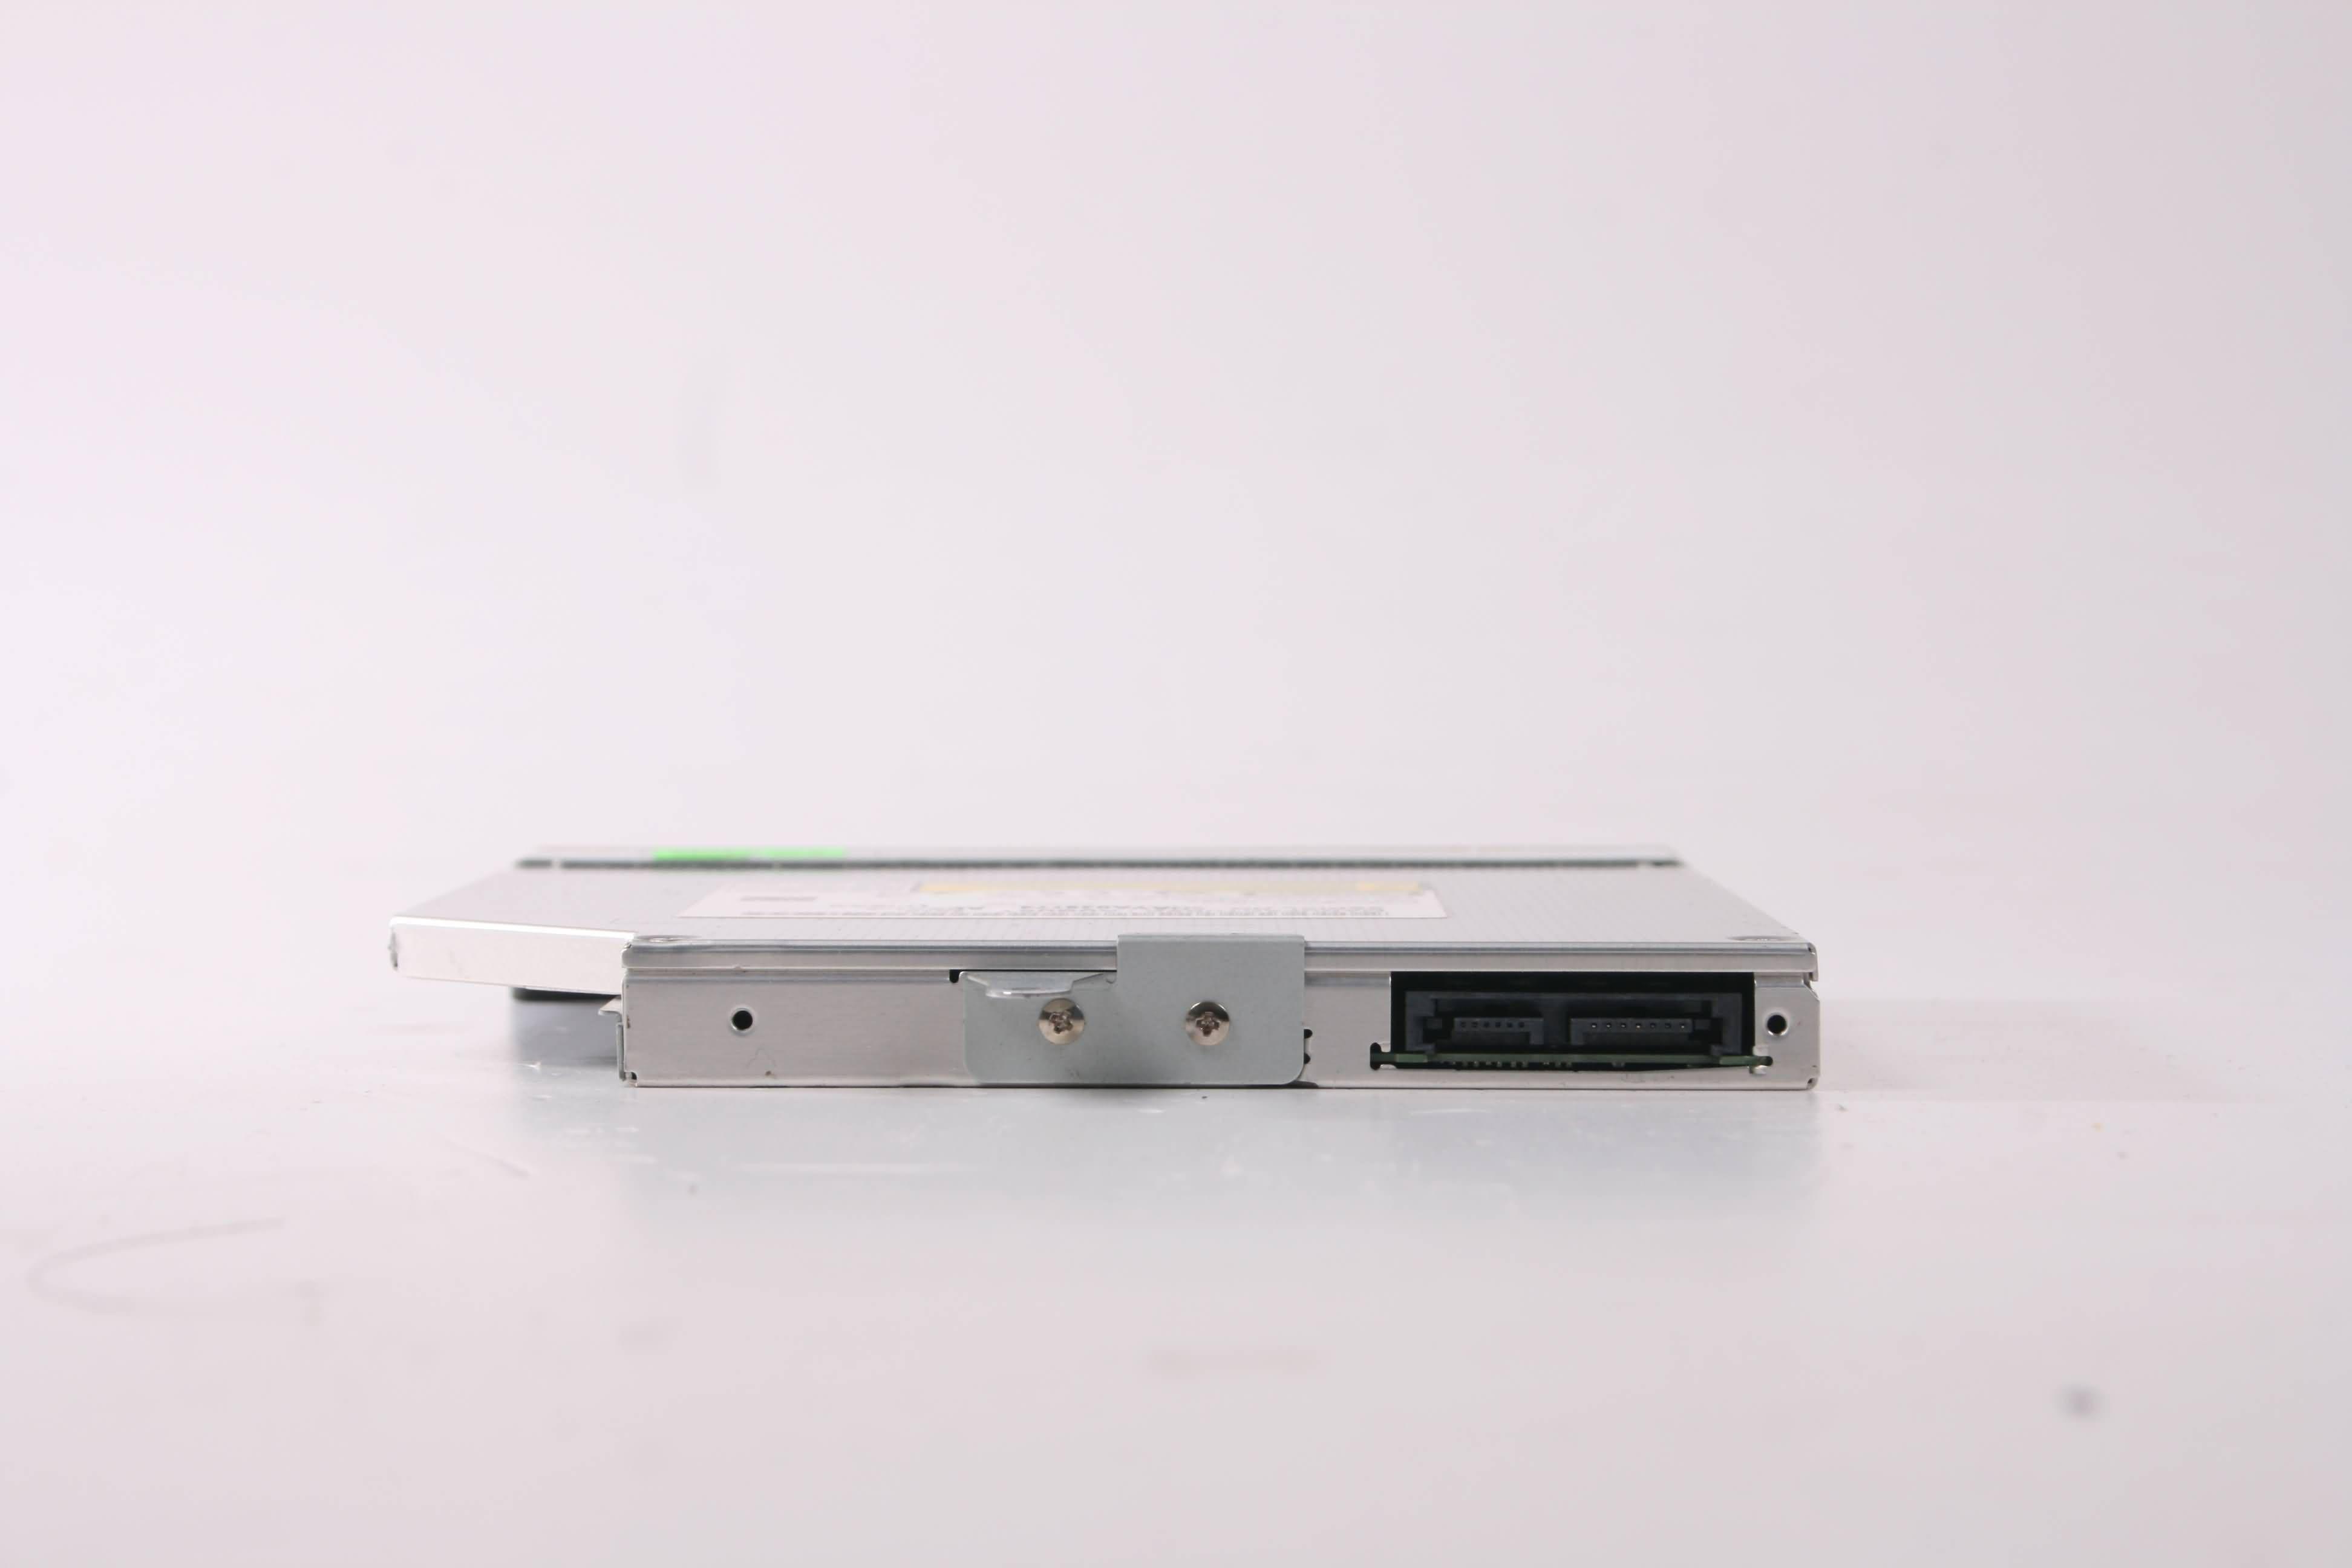 SONY Vaio VPCEB3J1E Optical Drive DVD/RW UJ8A0